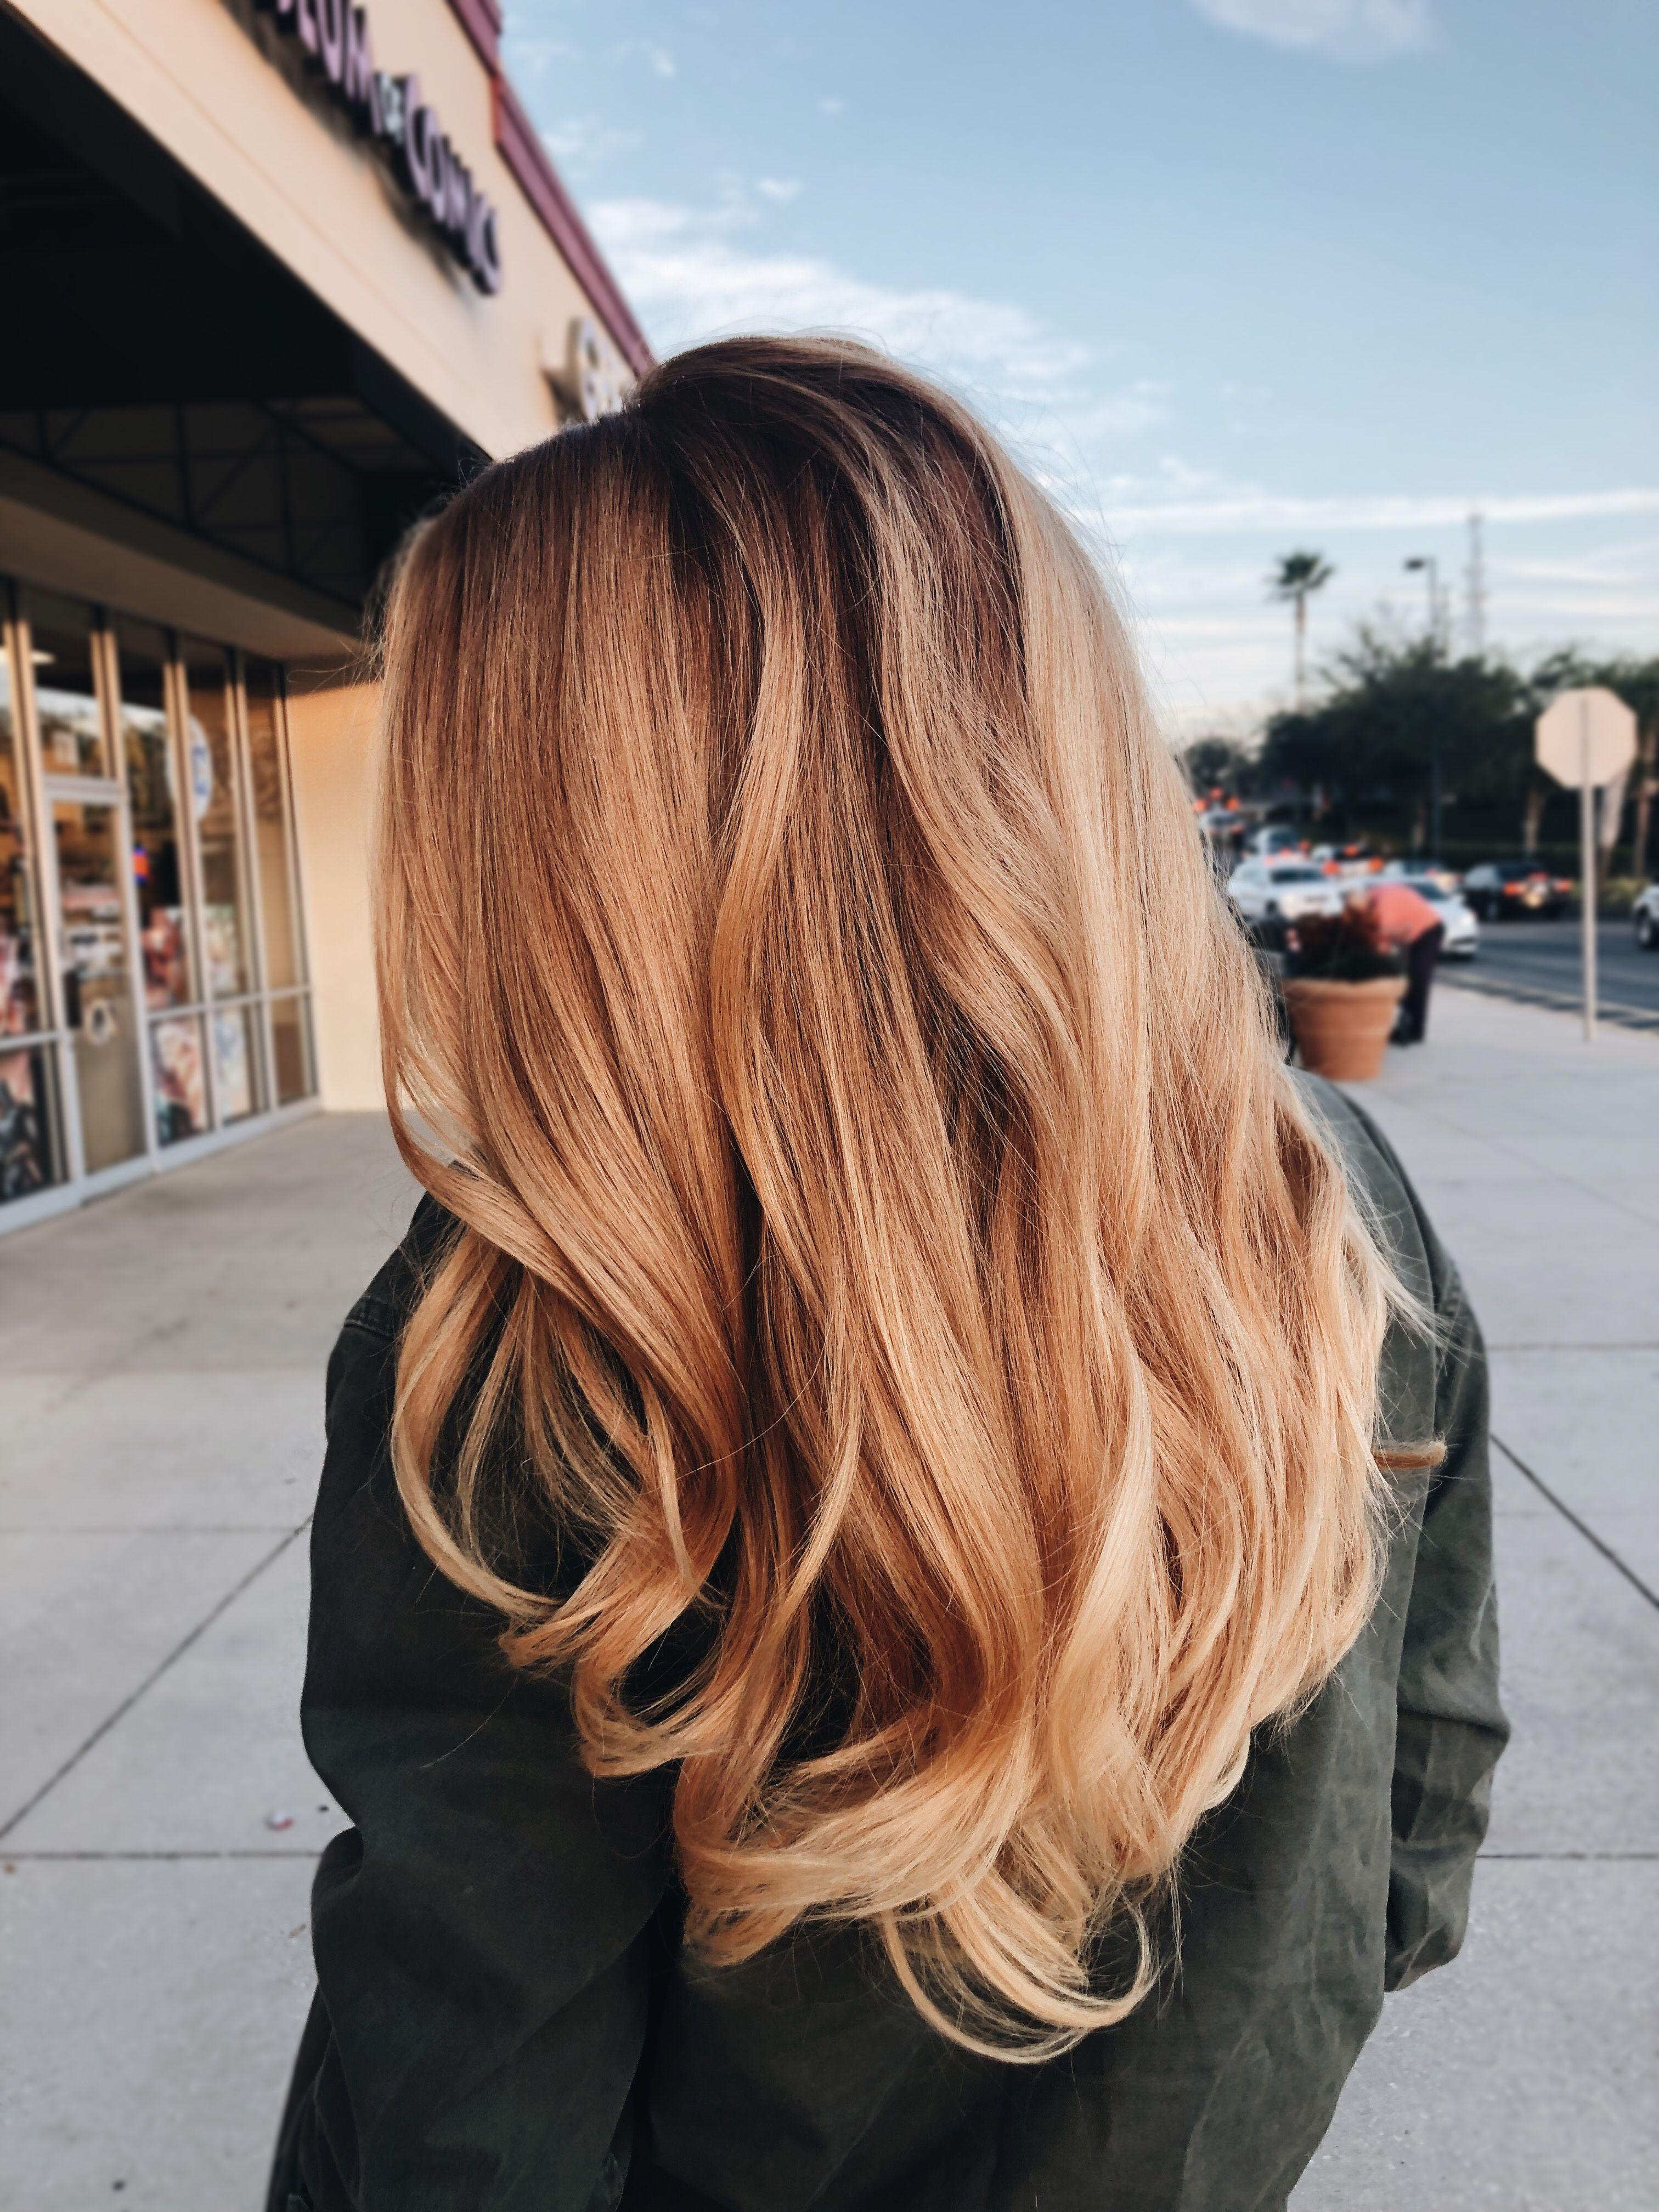 Strawberry Blonde Honey Blonde Balayage On Medium Length Hair